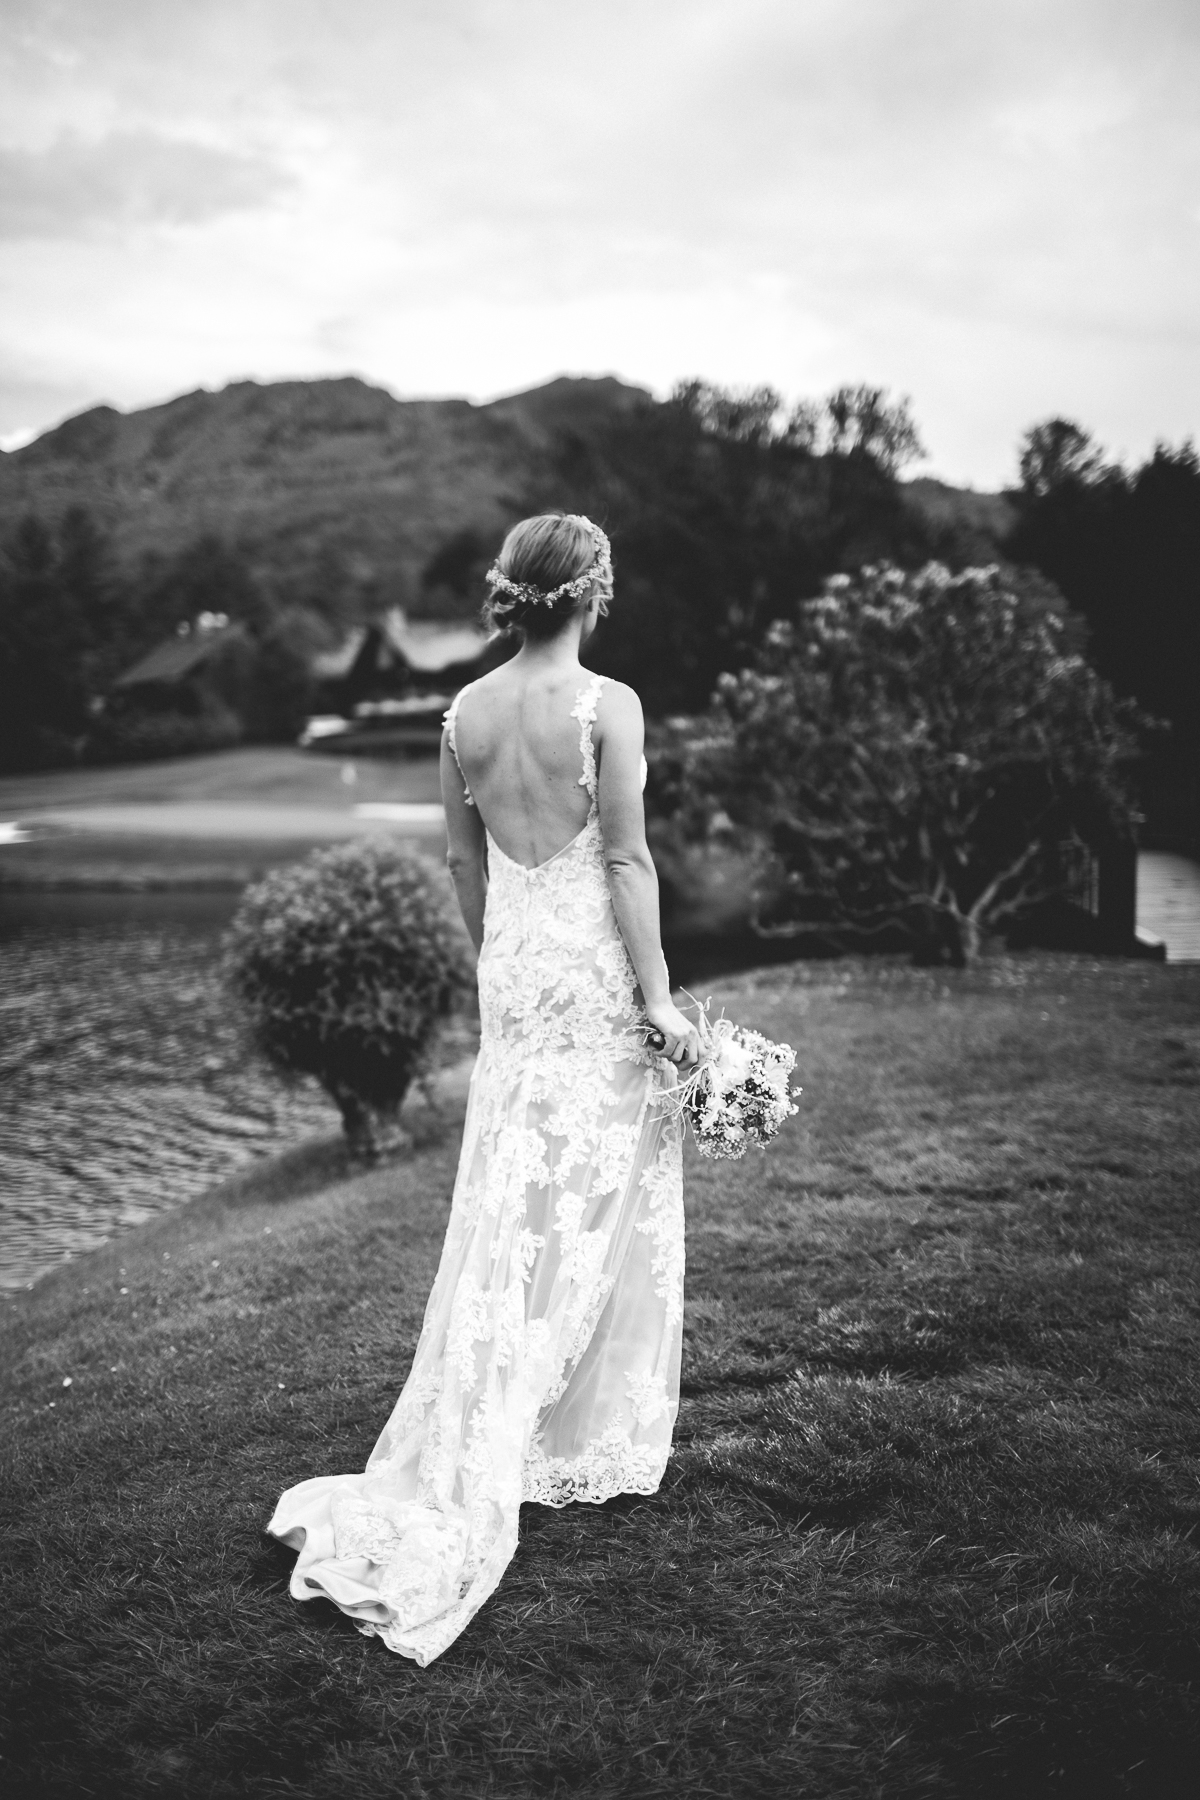 taylor-travis-grandfather-mountain-kelley-raye-north-carolina-wedding-photographer-22.jpg